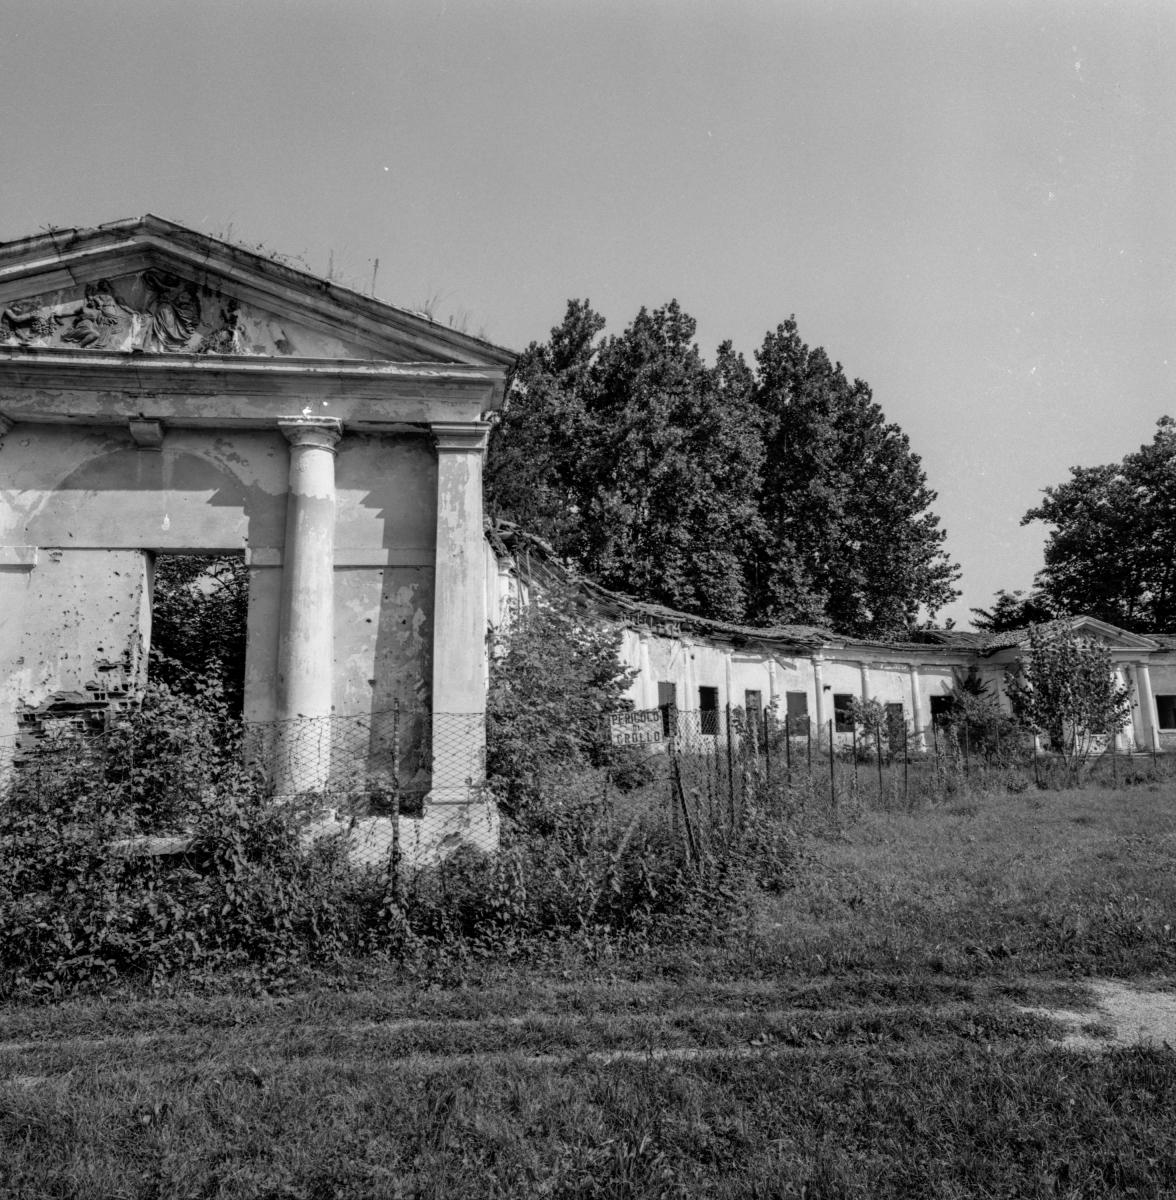 villamargherita2-1977